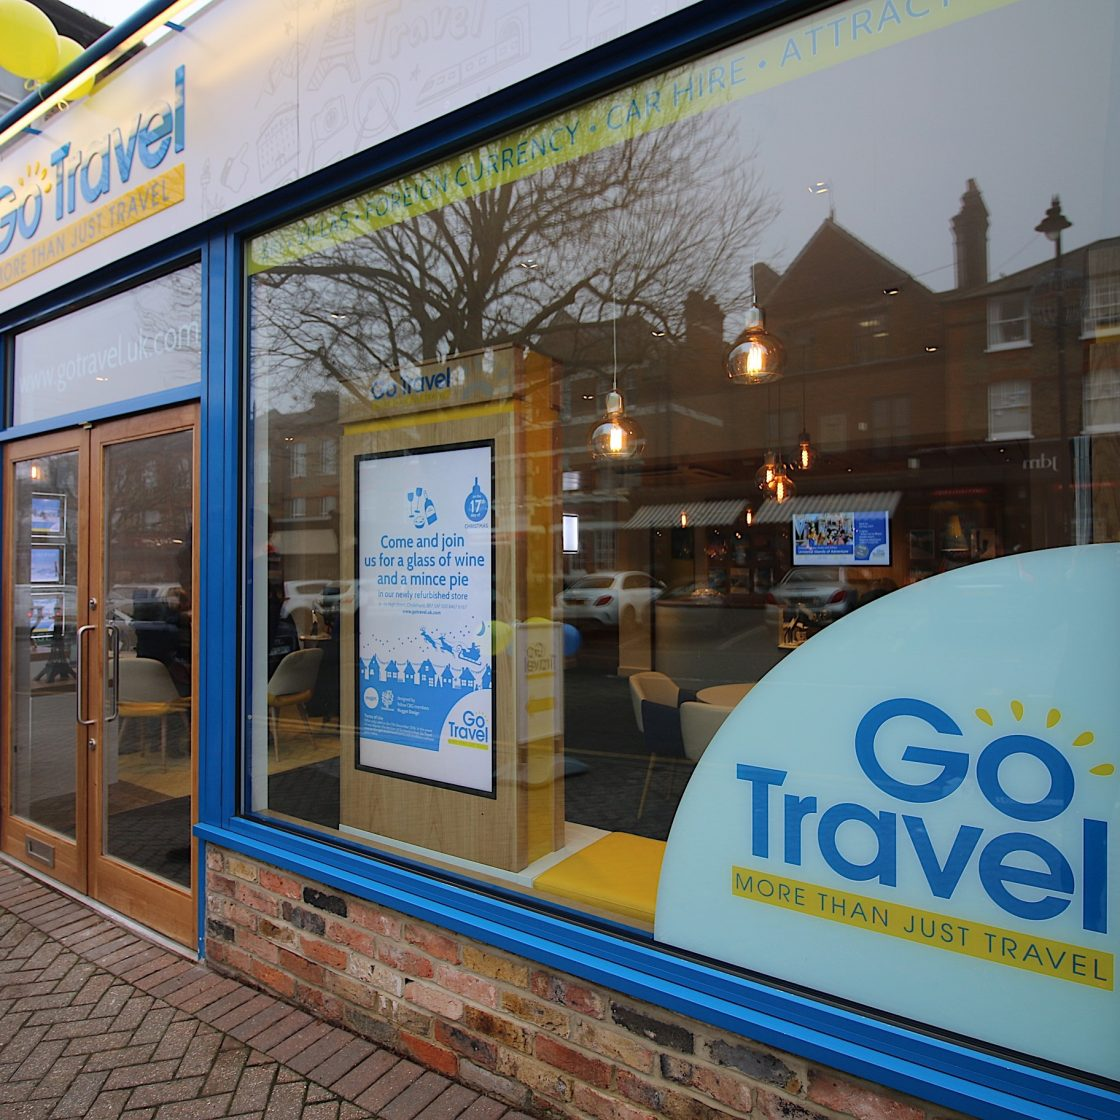 Go Travel_Chislhrust_Shopfront Interior Design By Nugget Design 03